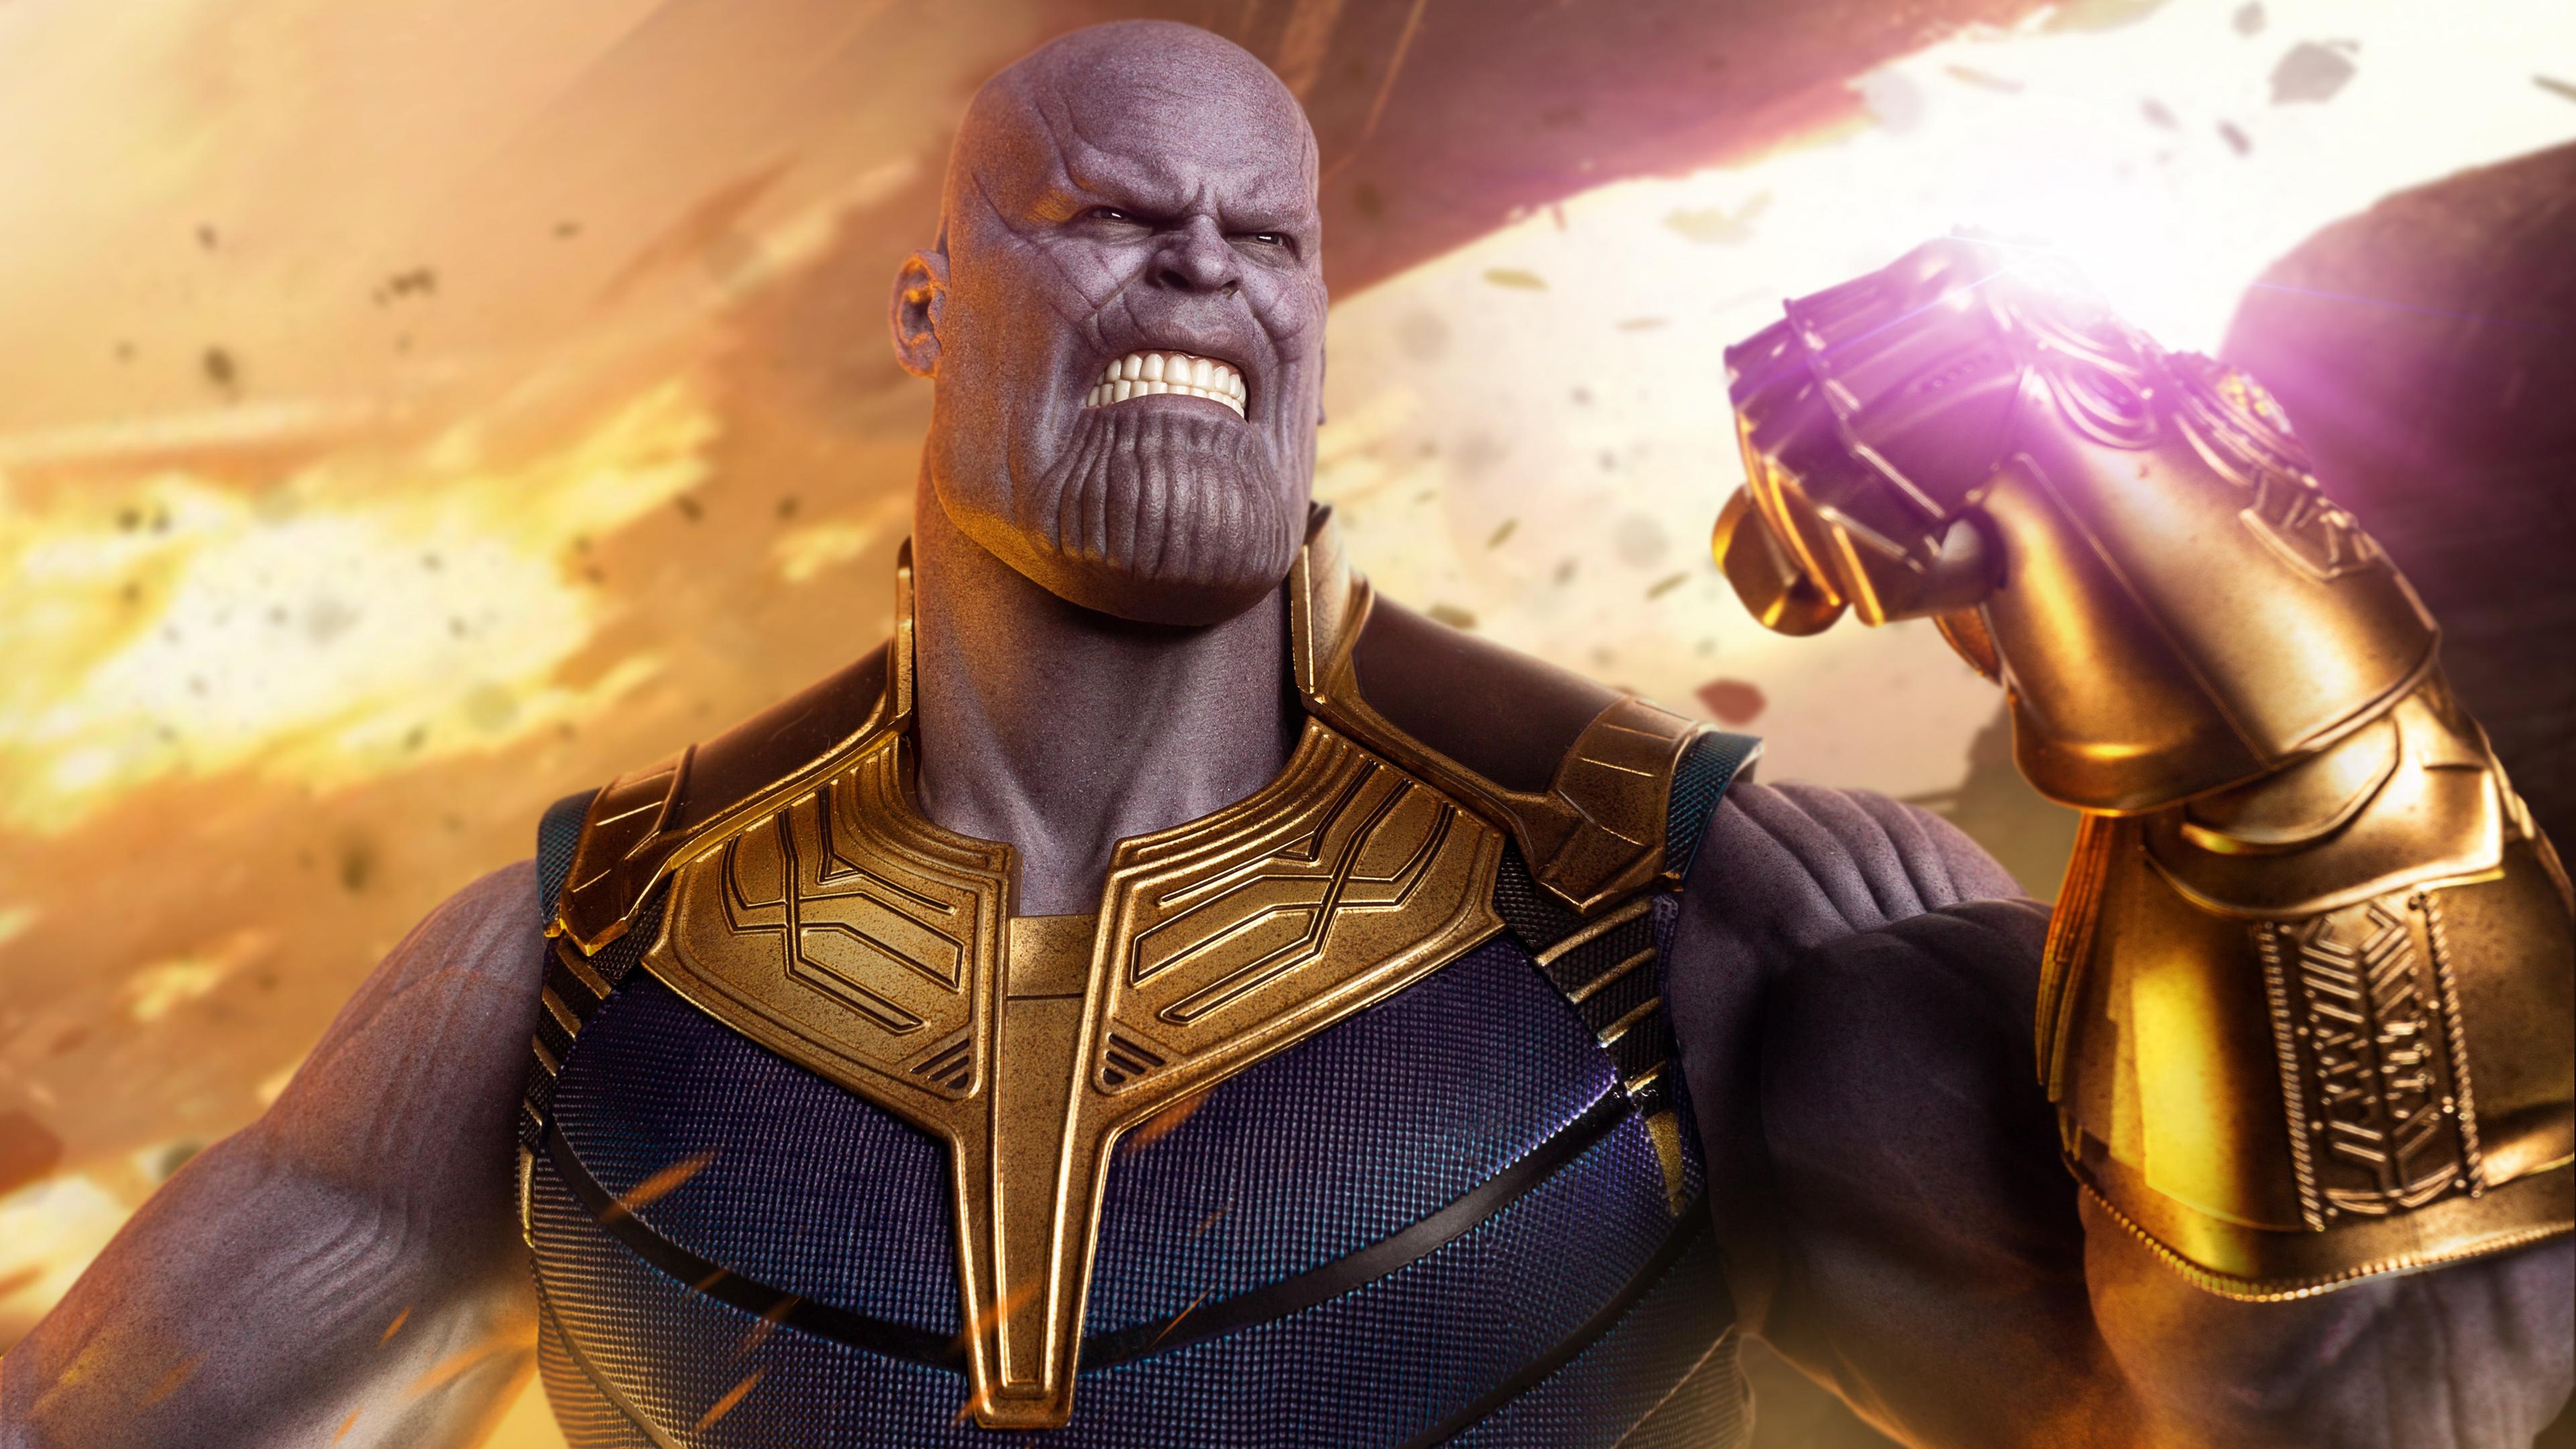 thanos 1563220279 - Thanos - thanos-wallpapers, supervillain wallpapers, superheroes wallpapers, hd-wallpapers, digital art wallpapers, artwork wallpapers, 5k wallpapers, 4k-wallpapers